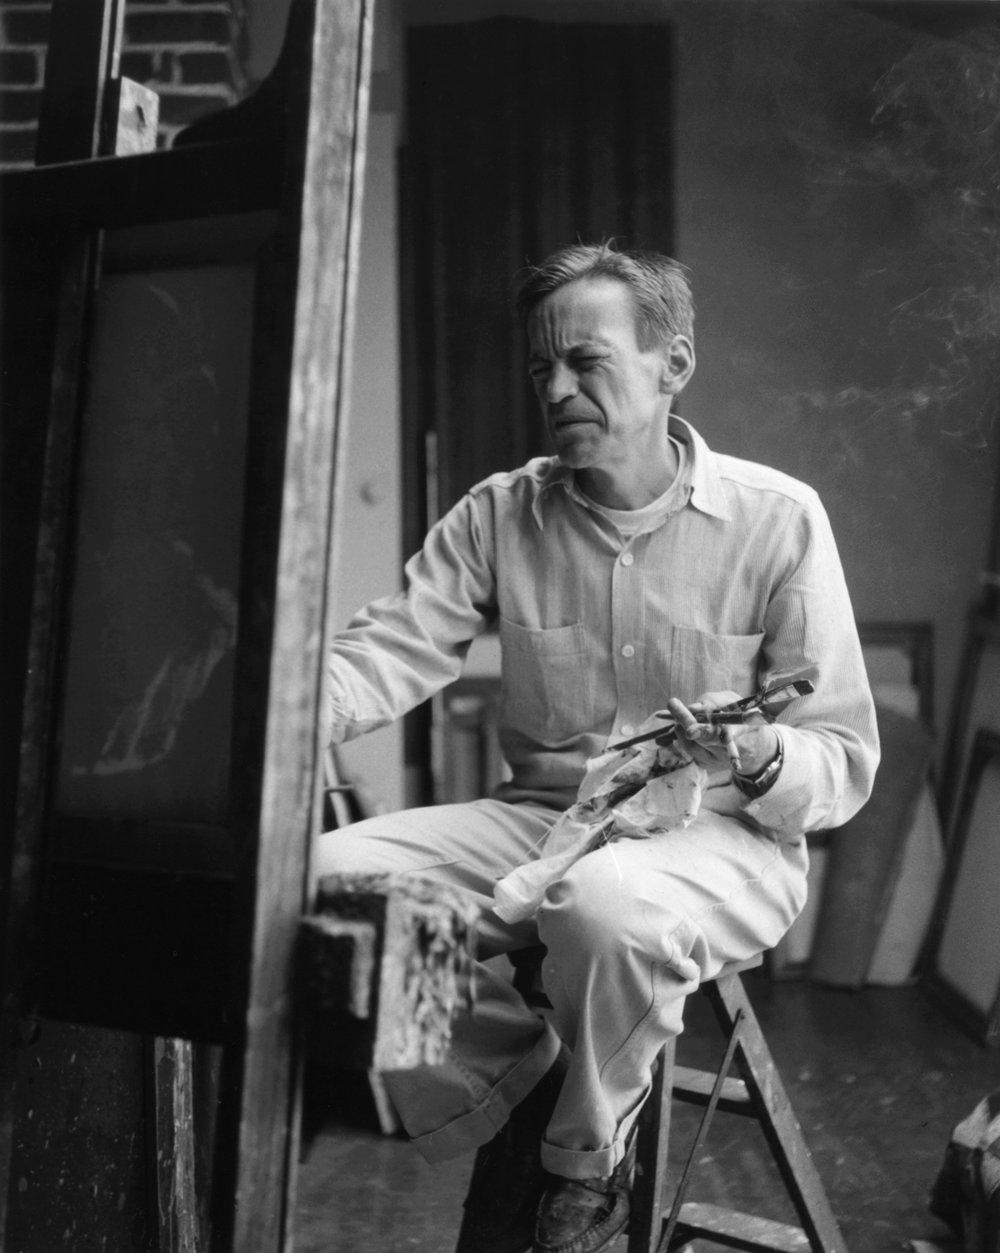 David Park, Painter 3, 1958